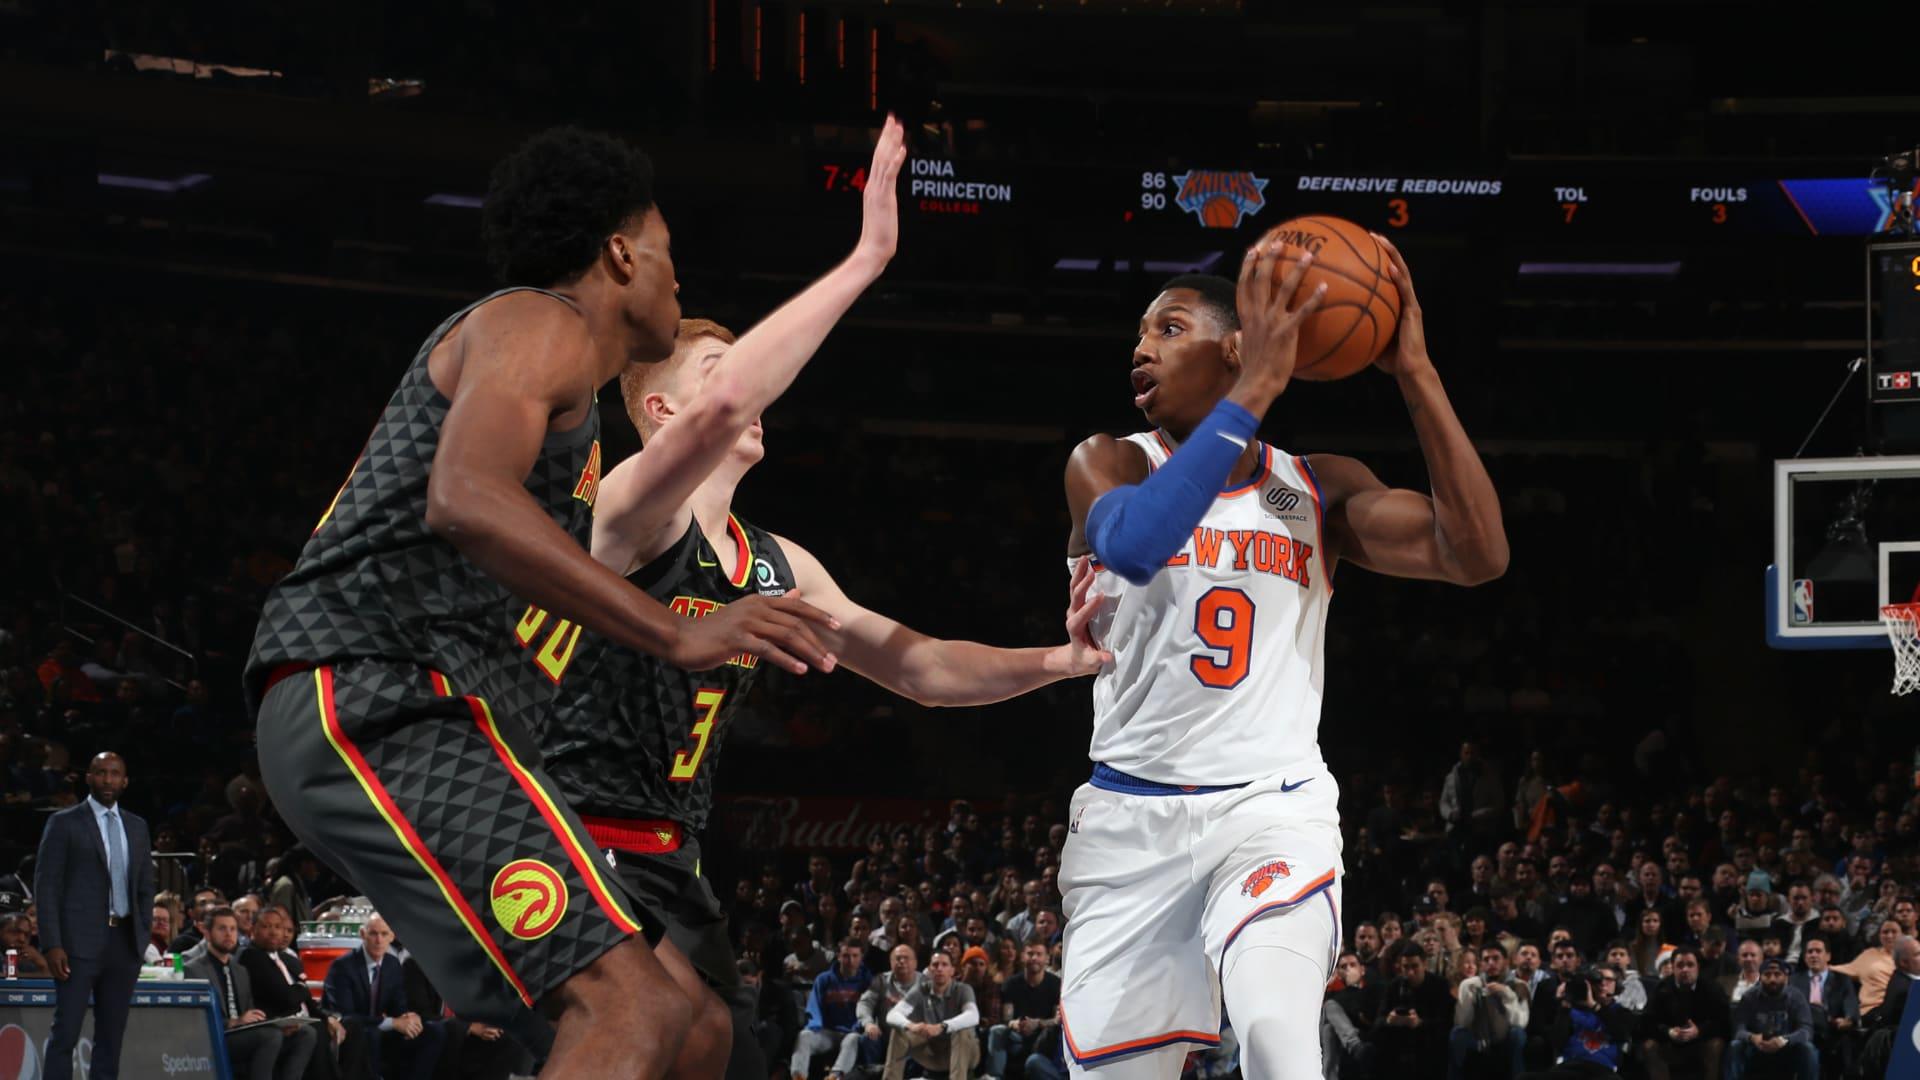 Hawks @ Knicks